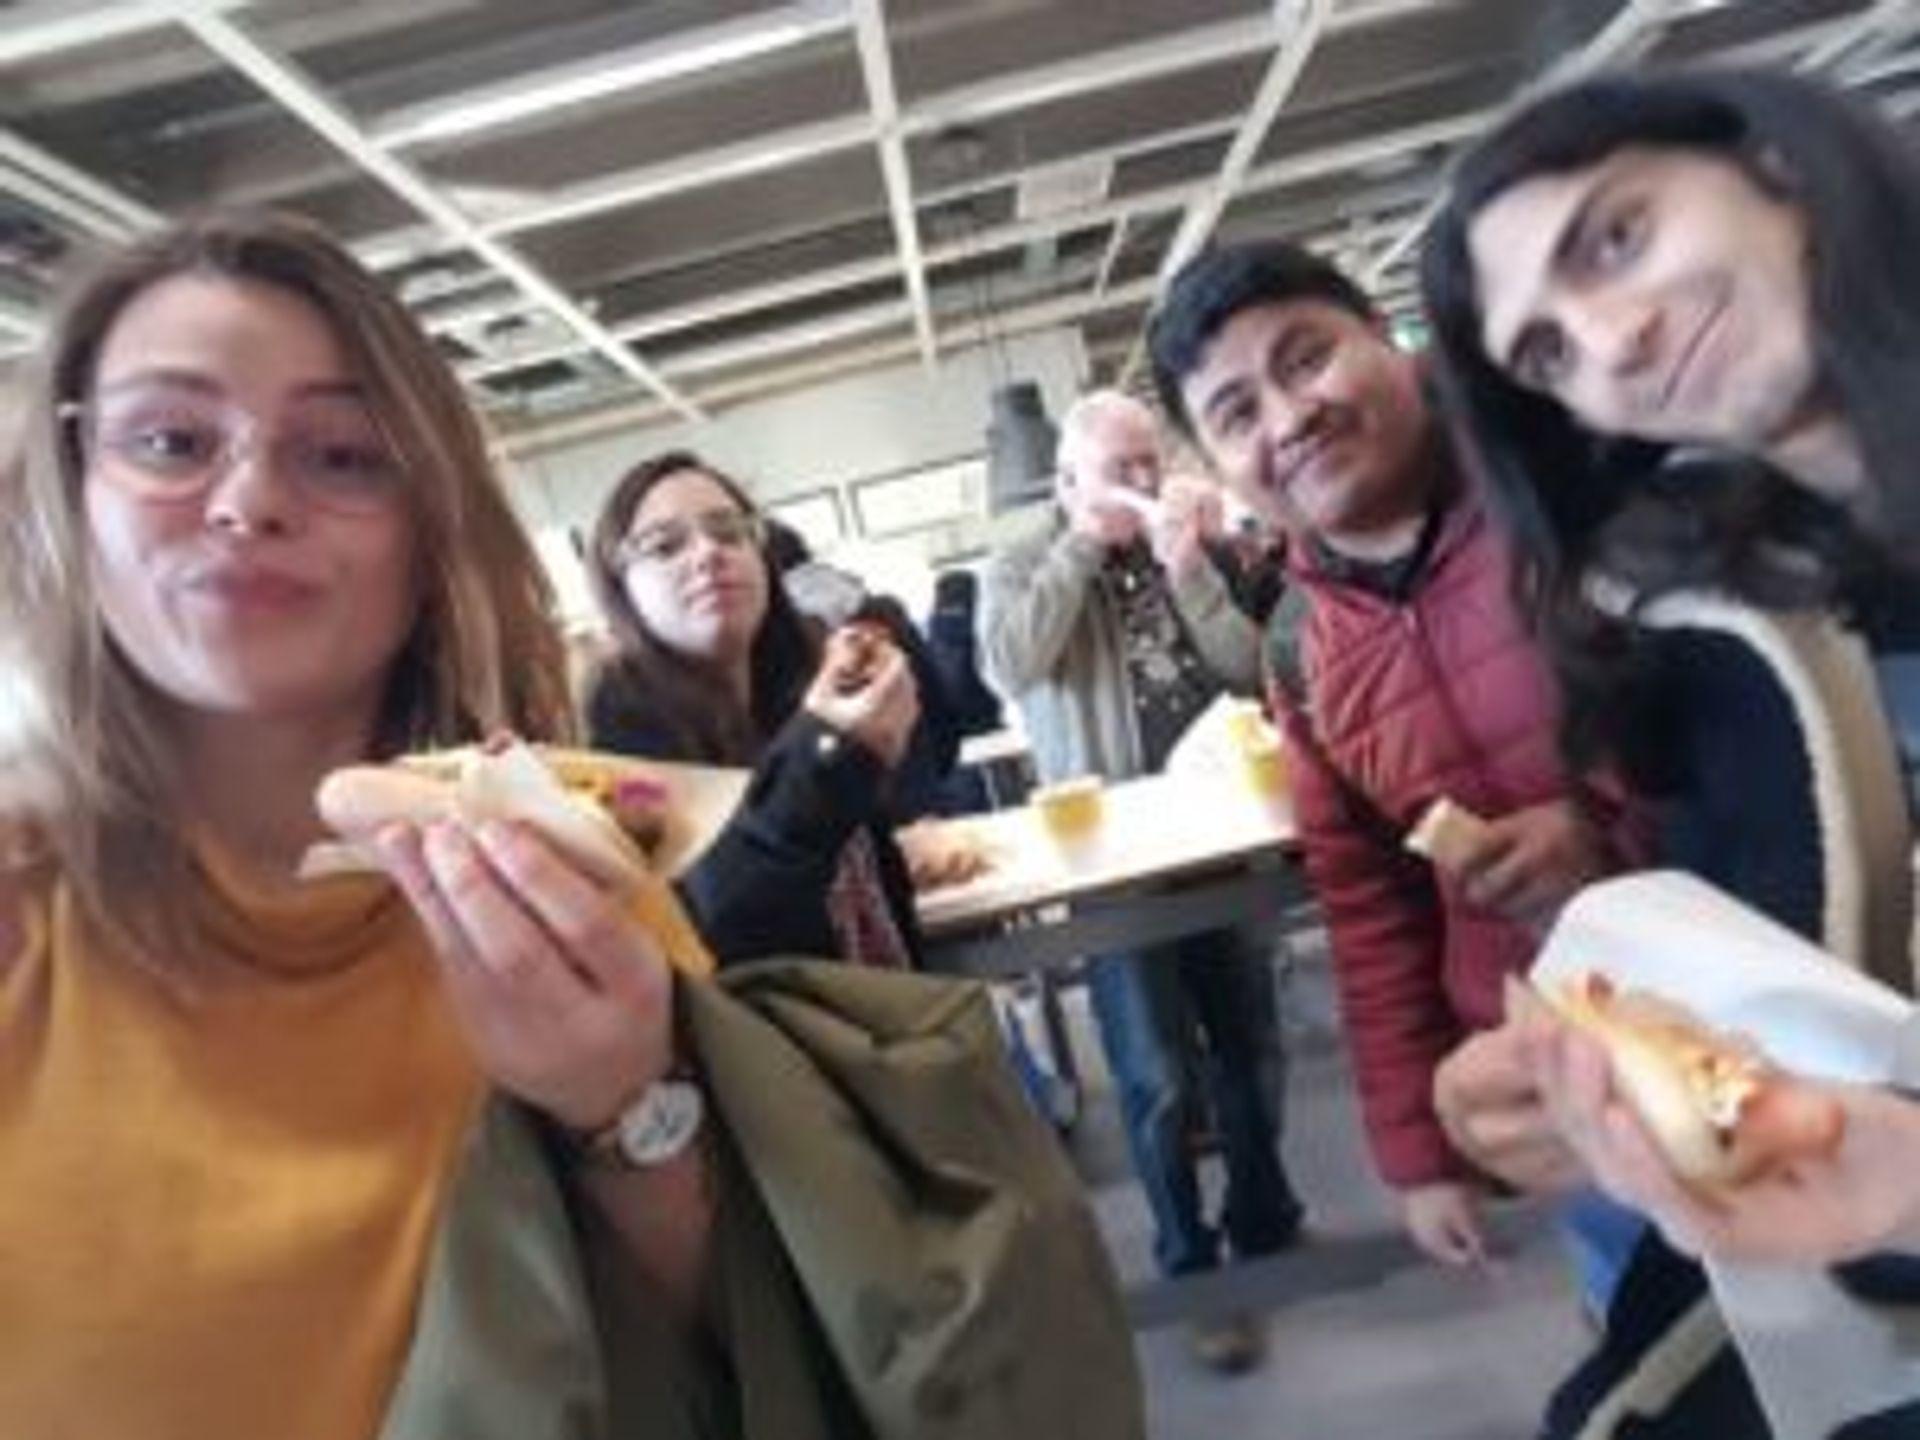 Camilo and several friends eat hotdogs in IKEA.